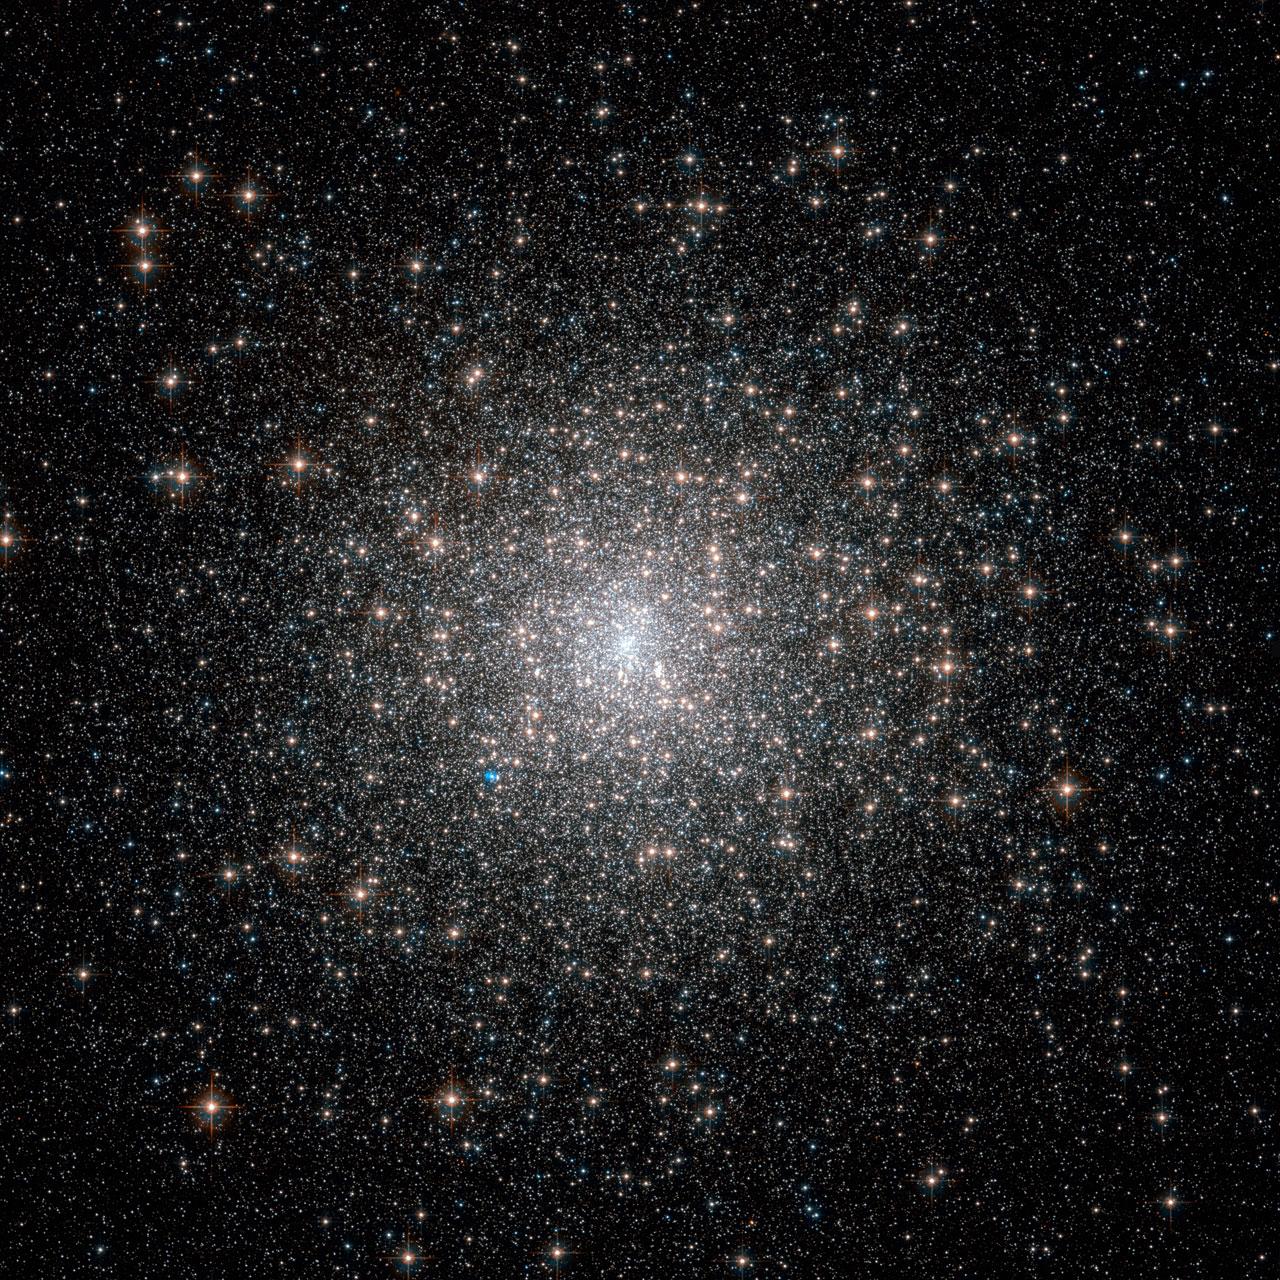 Messier 15, a globular star cluster